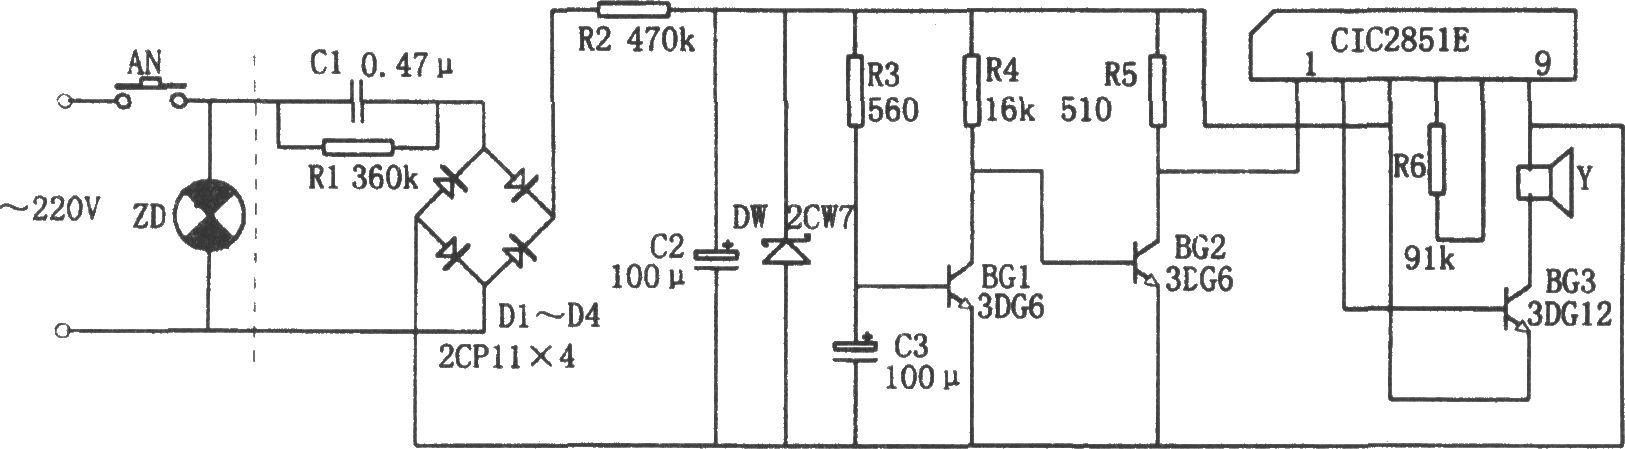 CIC2851E音乐型电冰箱关门提醒电路